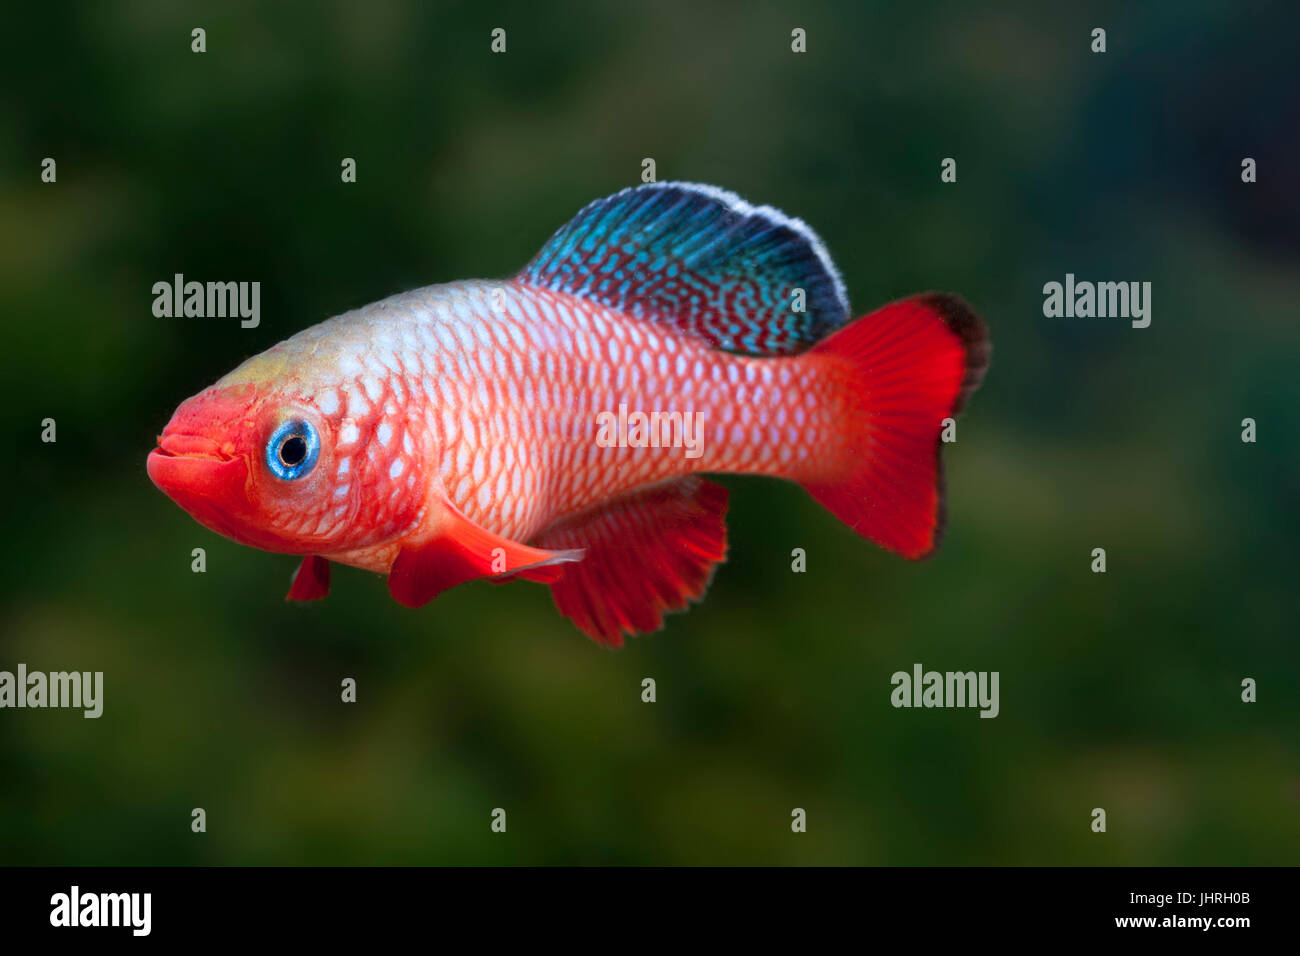 Nothobrancus especies, peces tropicales Foto de stock